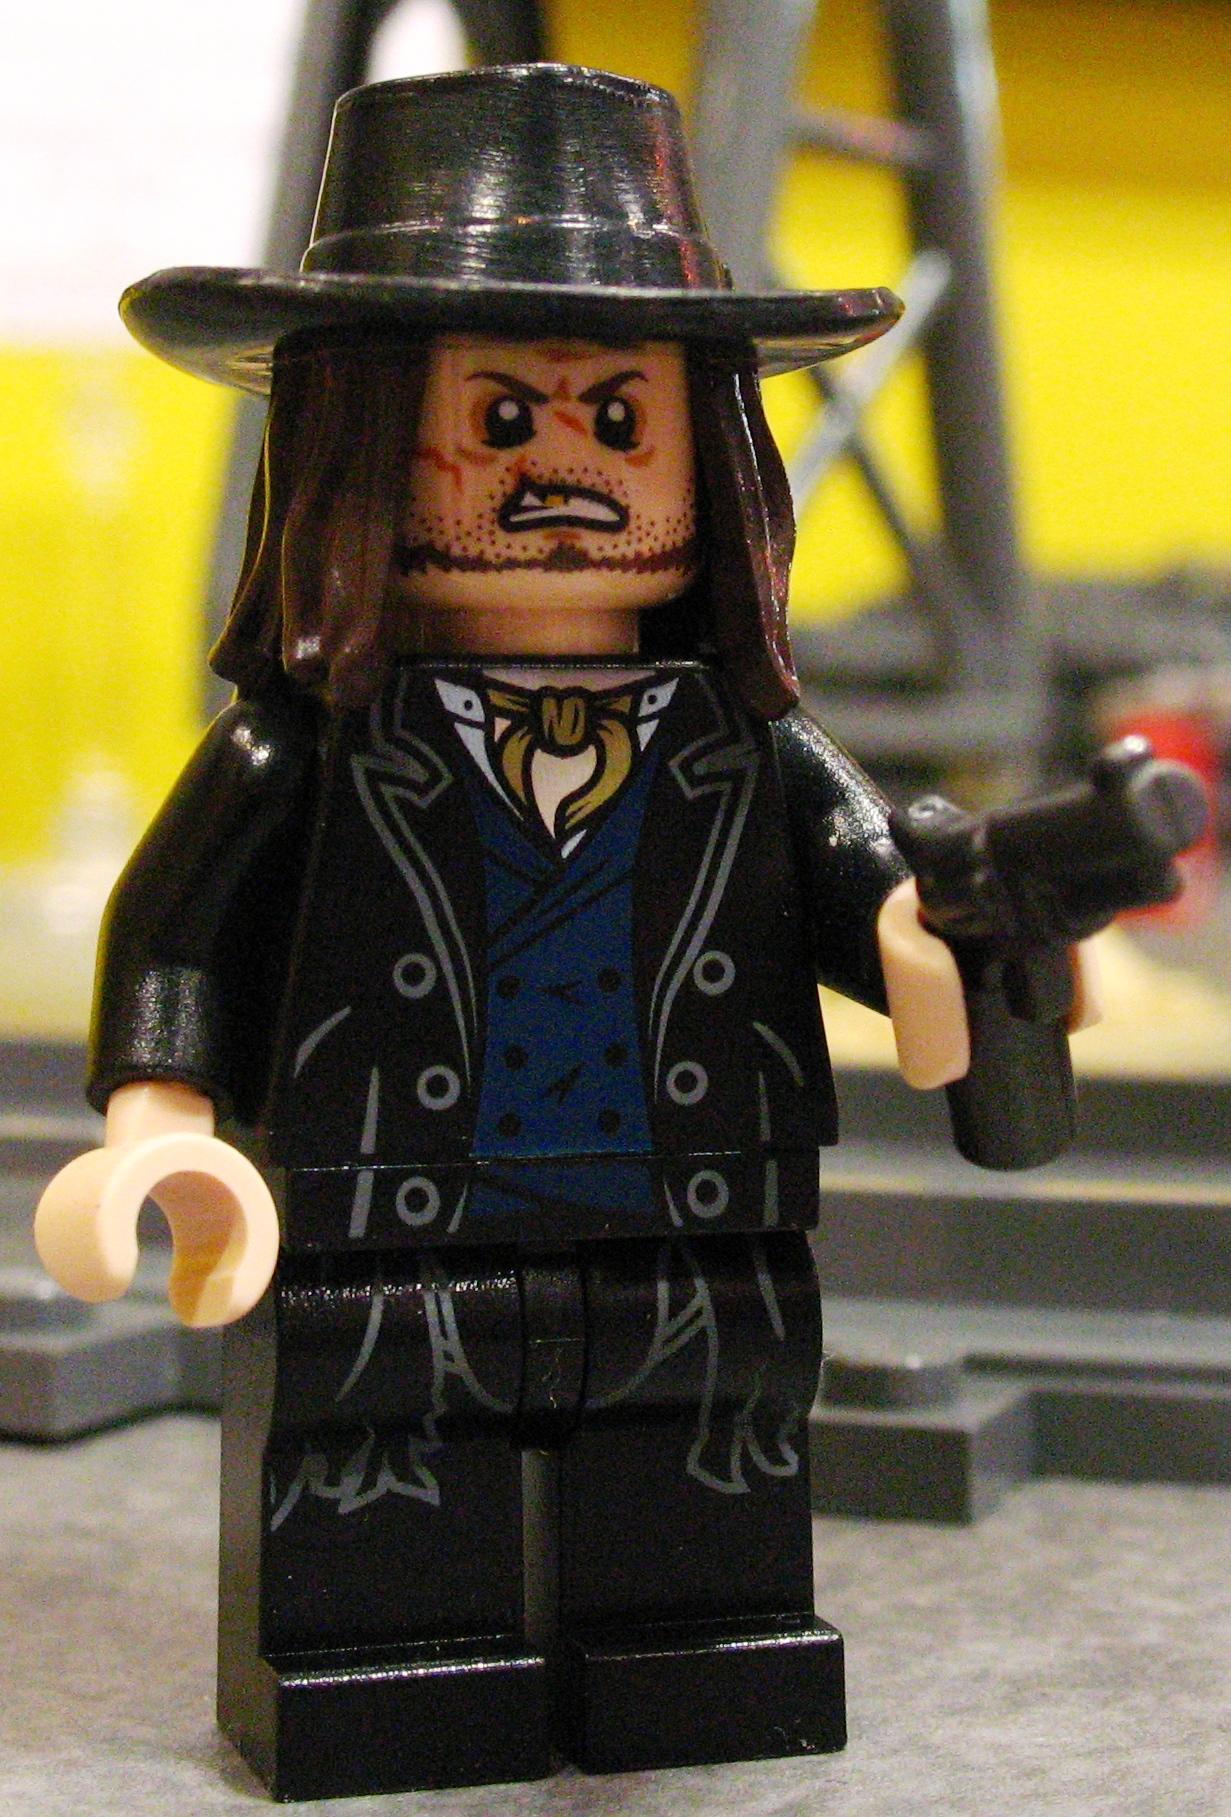 79111 Constitution Train Chase - Brickipedia, the LEGO Wiki